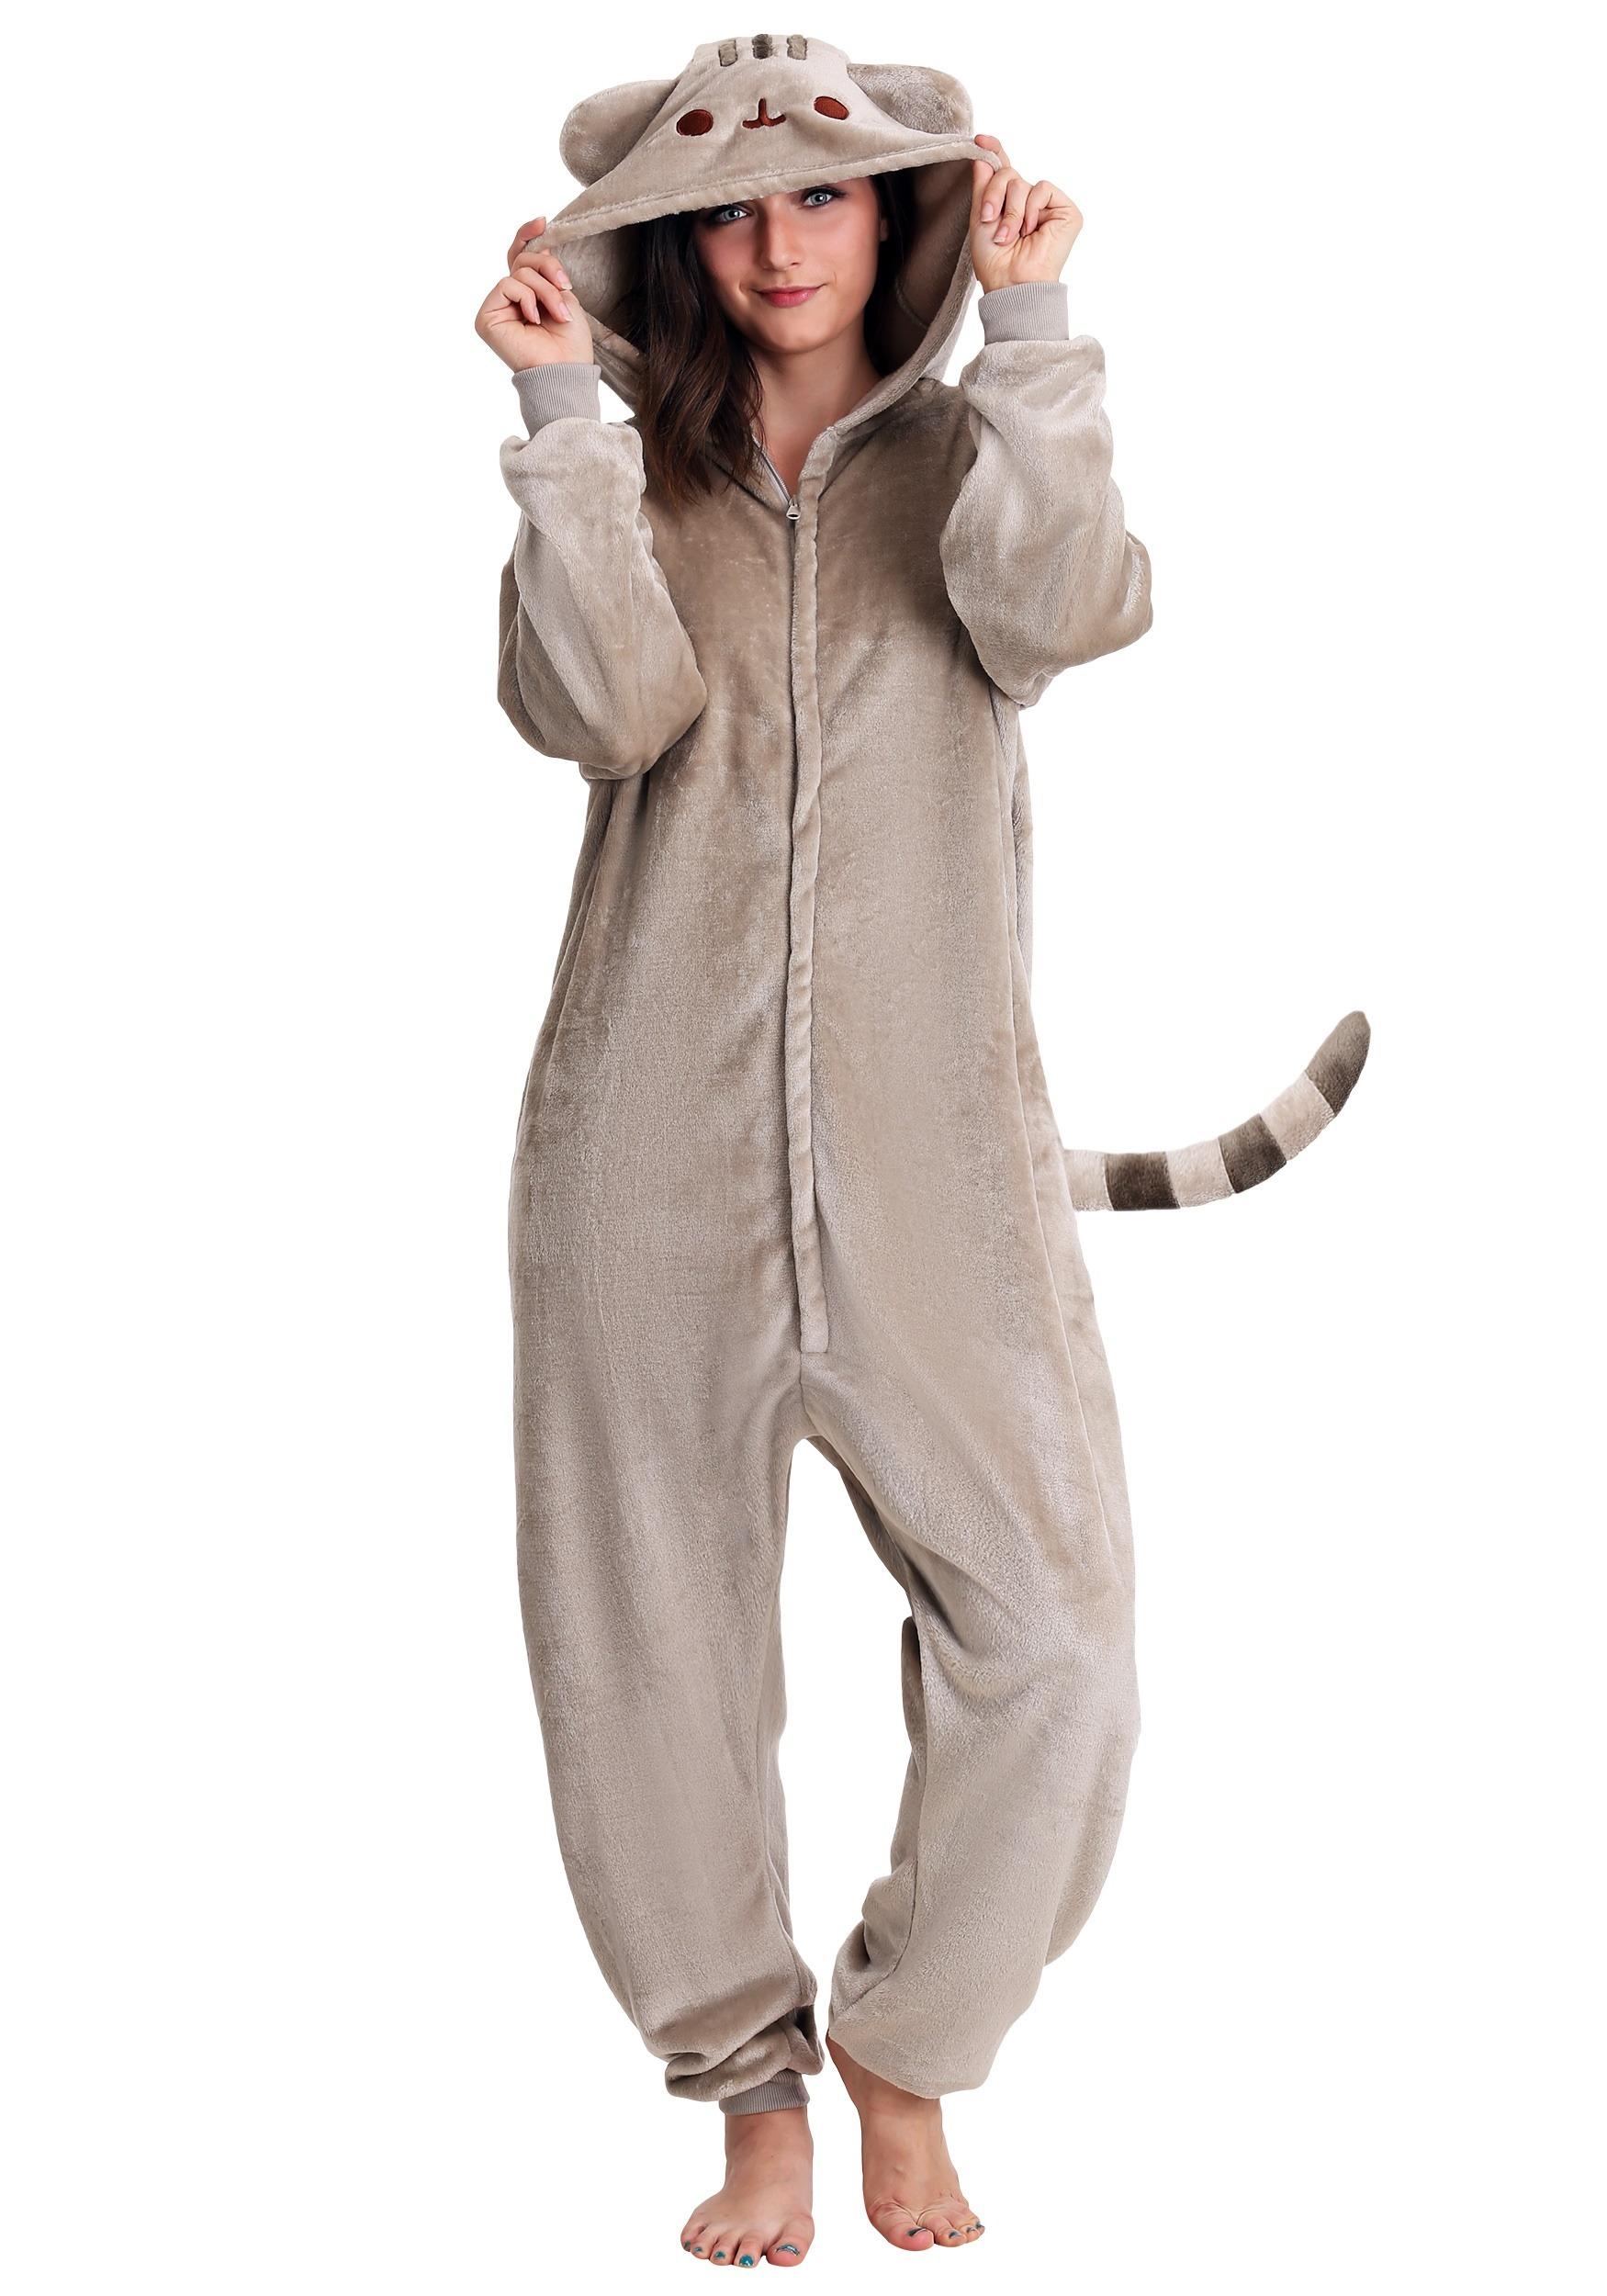 c99b133cca3771 Adult Kigurumi Pajamas Pusheen Cat